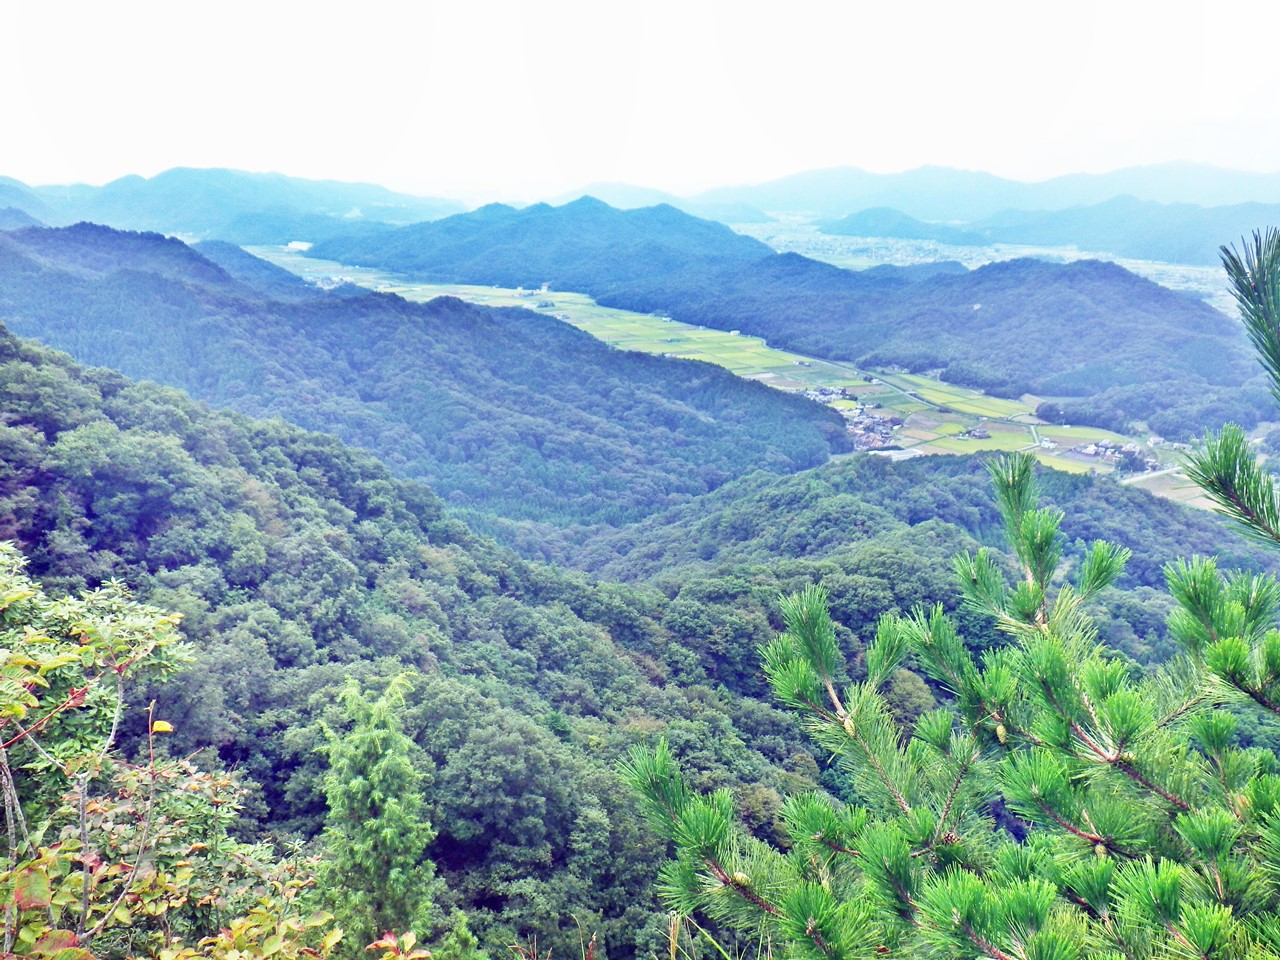 13a 小岩峰から南側の眺め